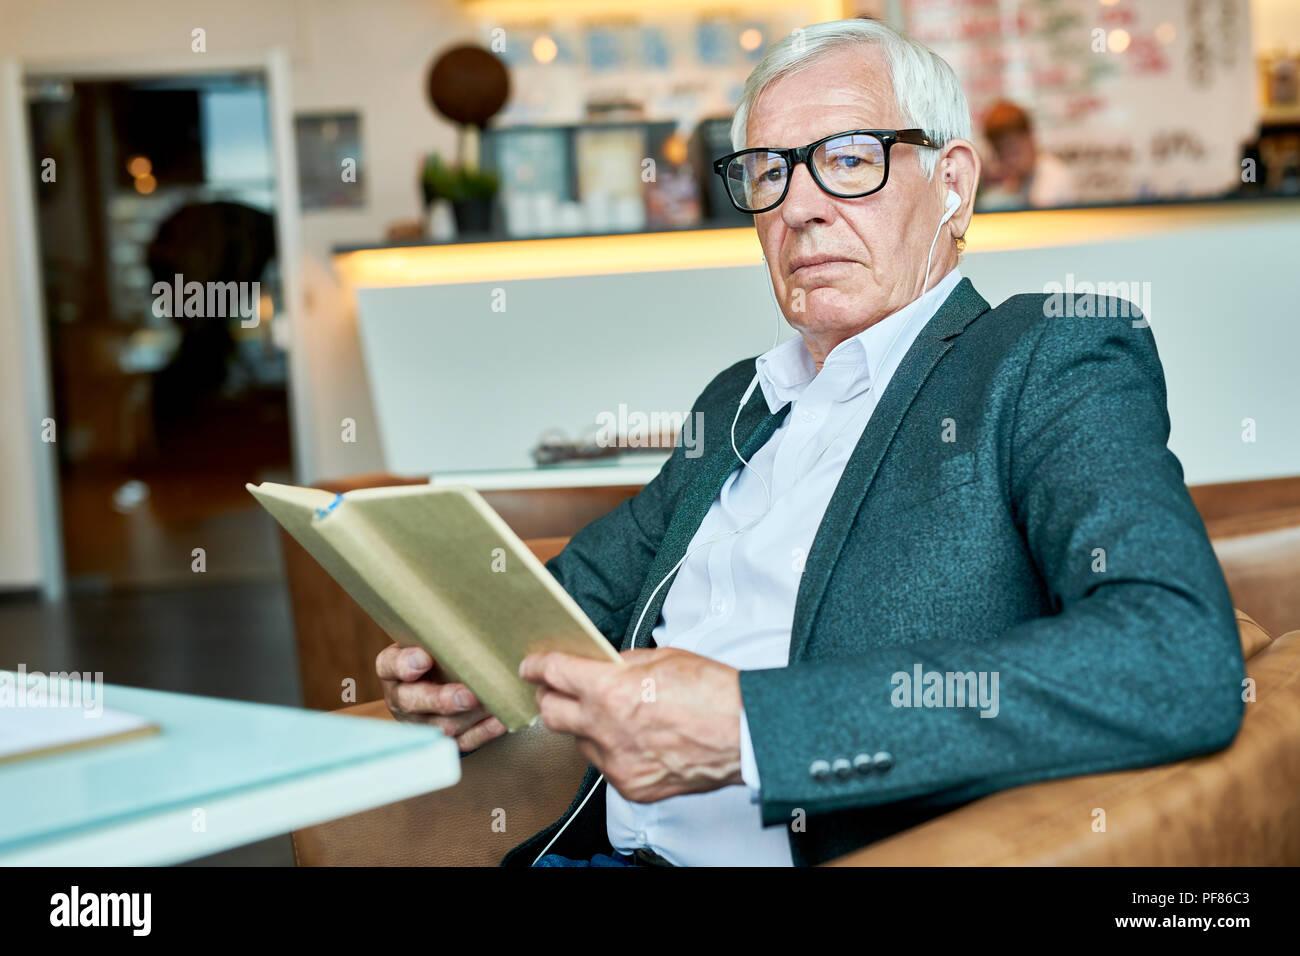 Pensive Senior Man Reading Book in Cafe - Stock Image